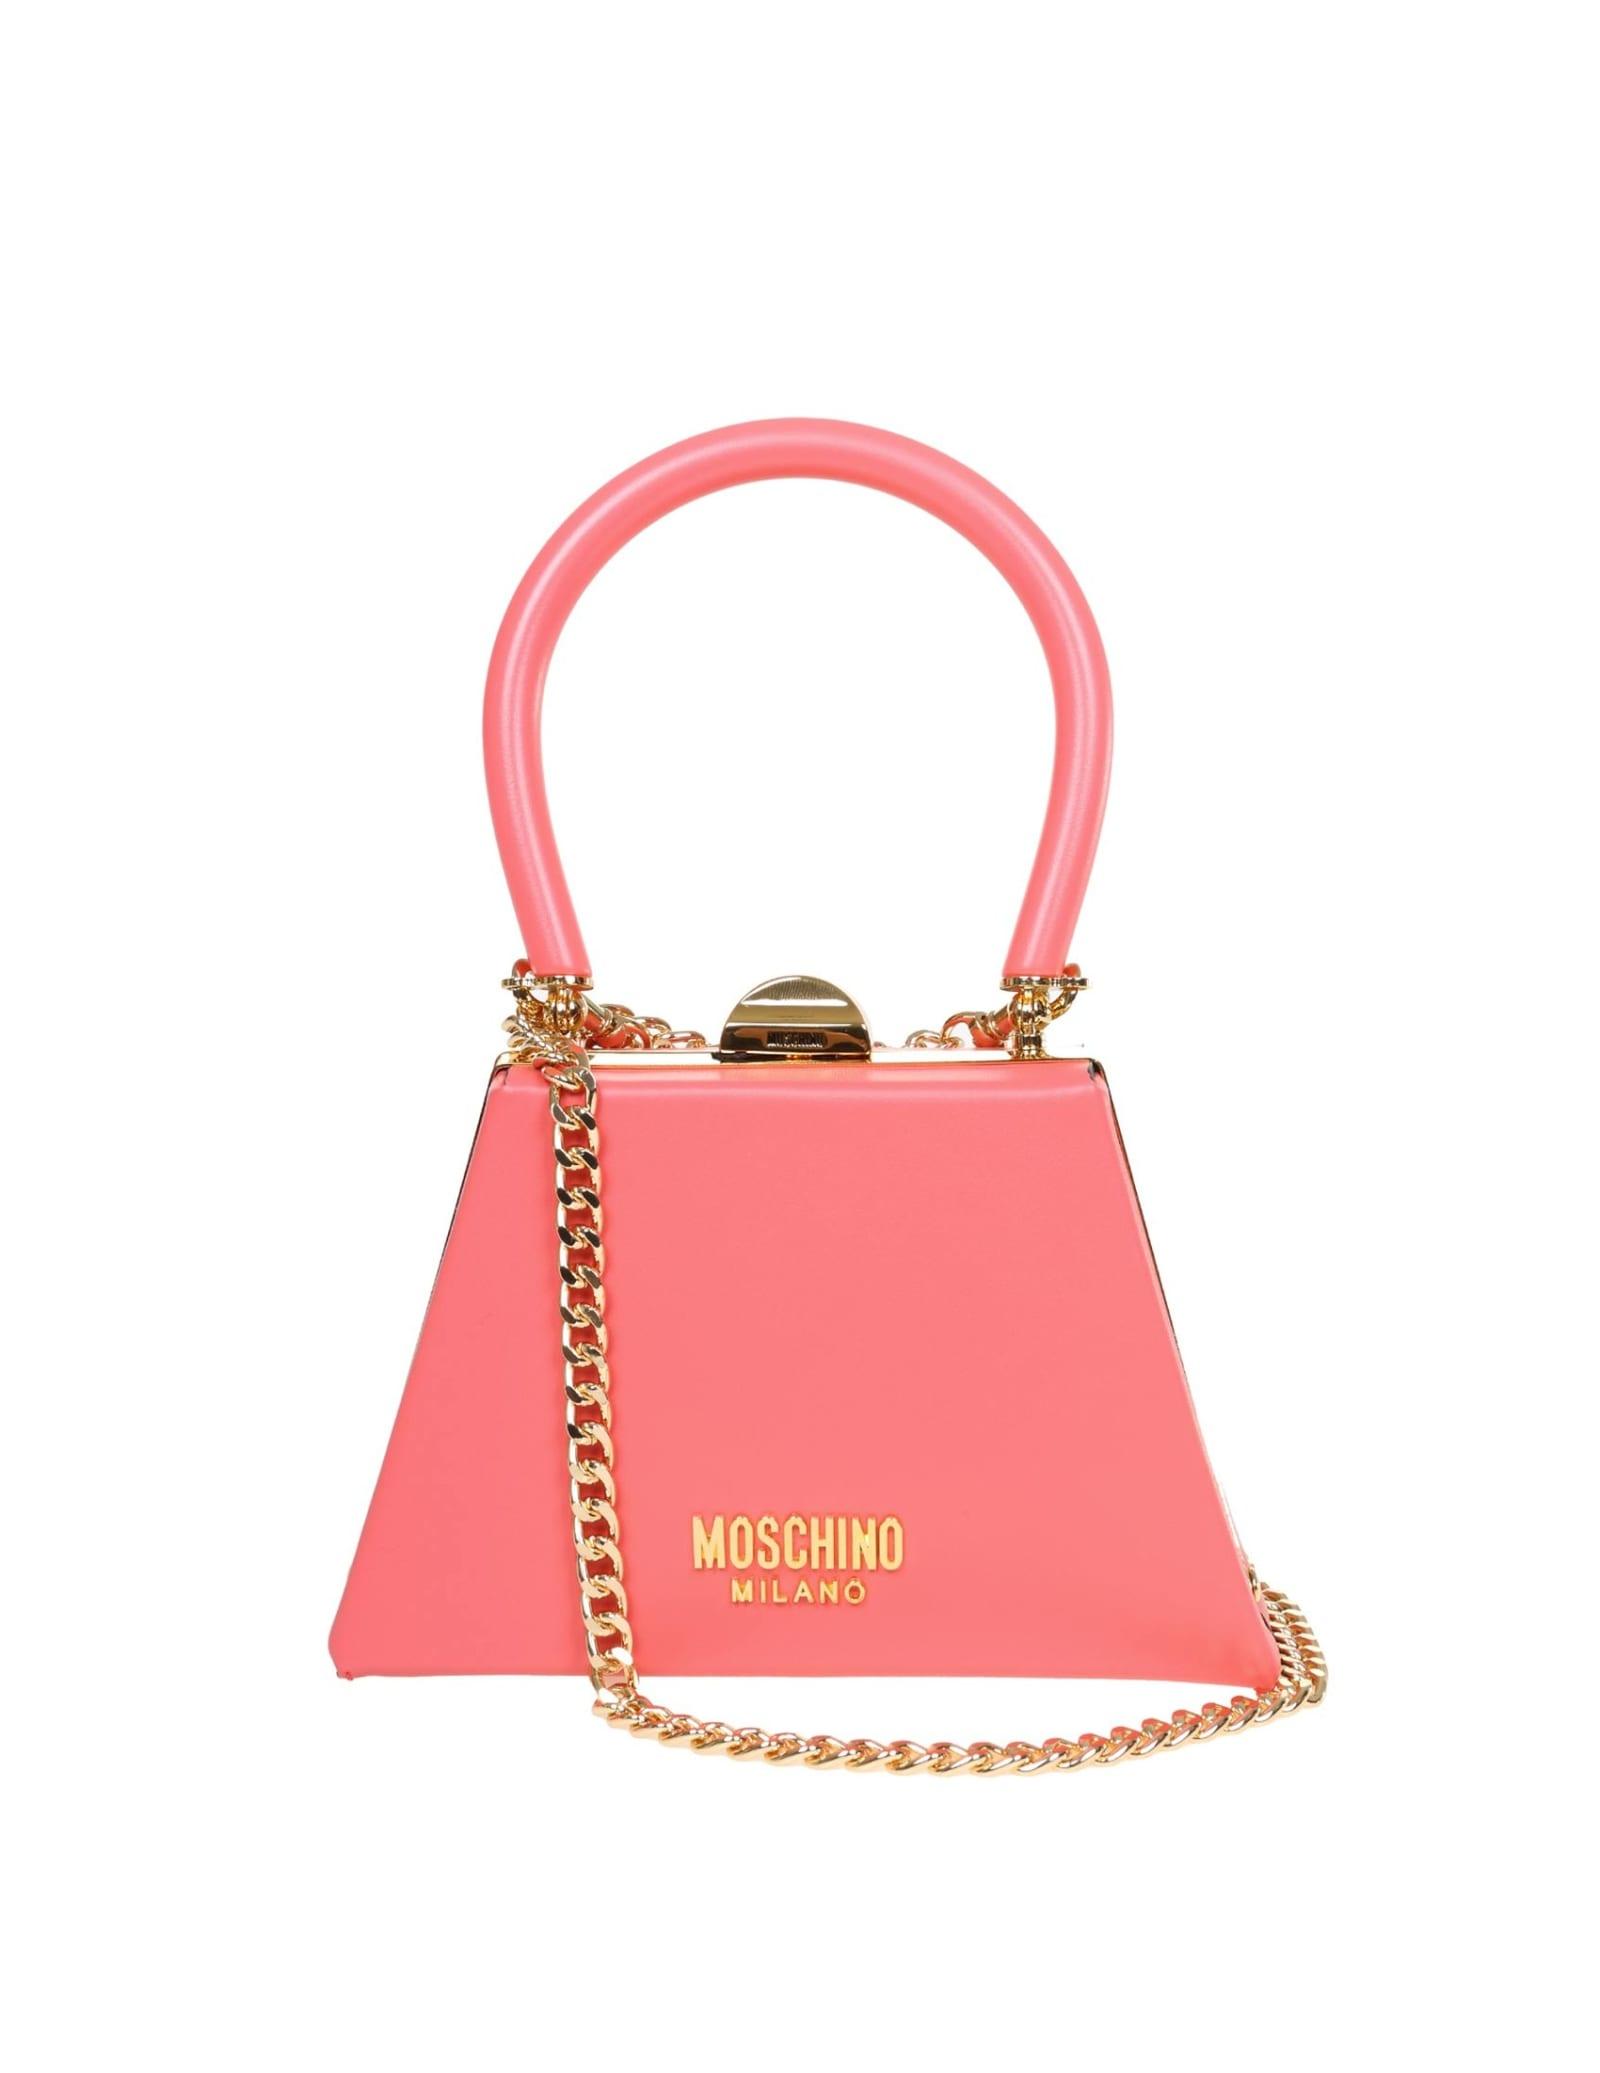 Moschino Handbags MINI HANDBAG IN CALFSKIN